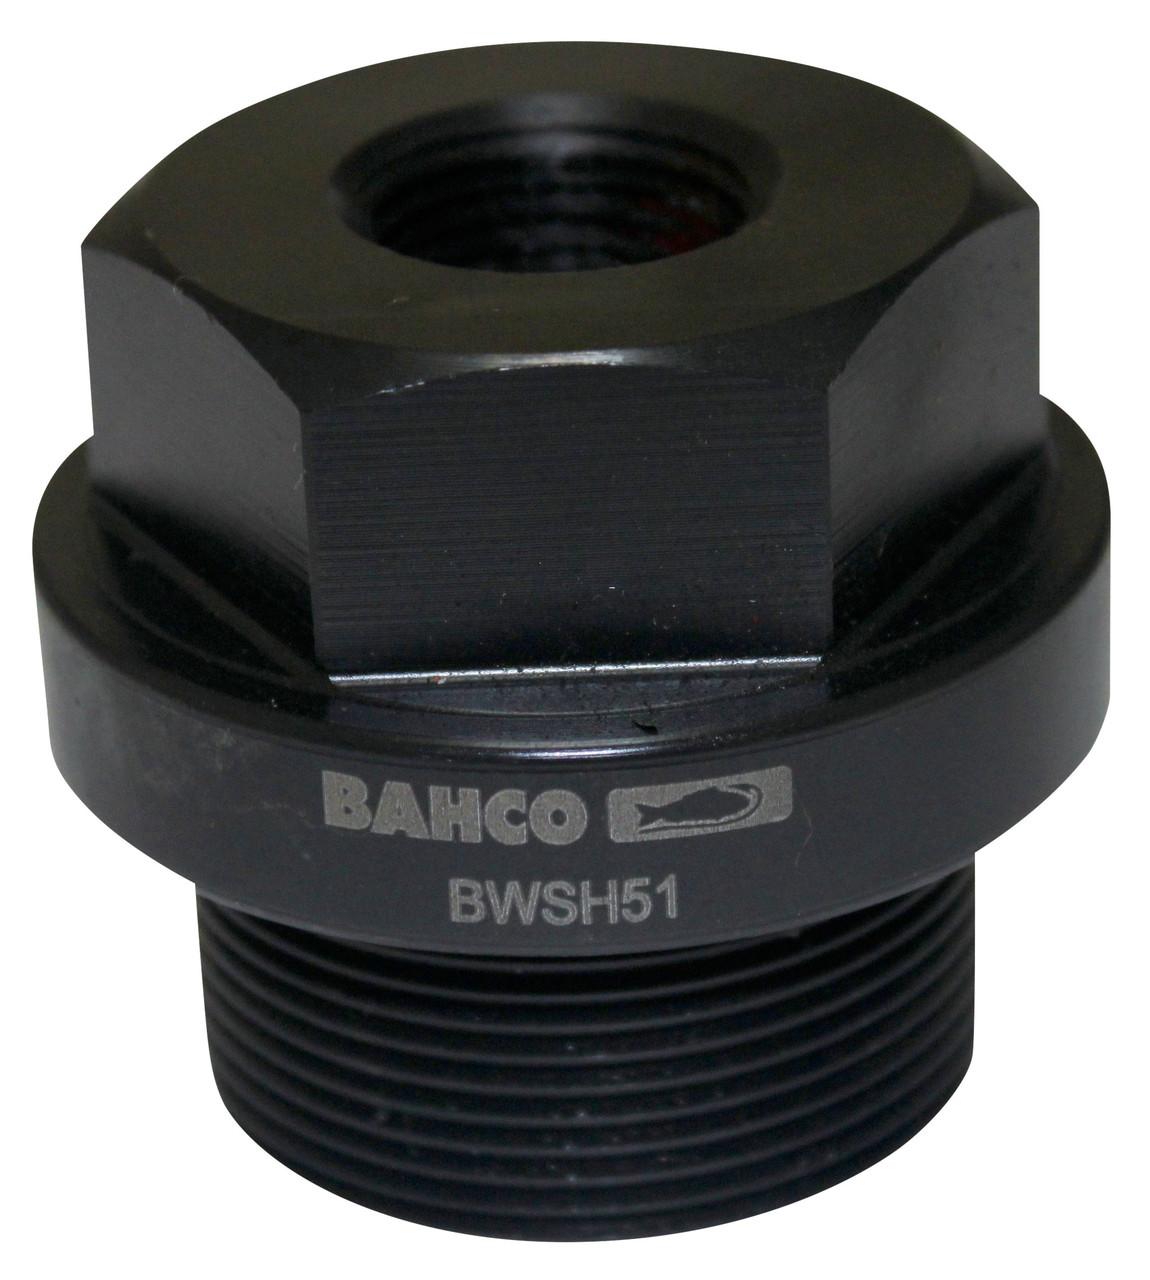 Адаптер M18, Bahco, BWSH51